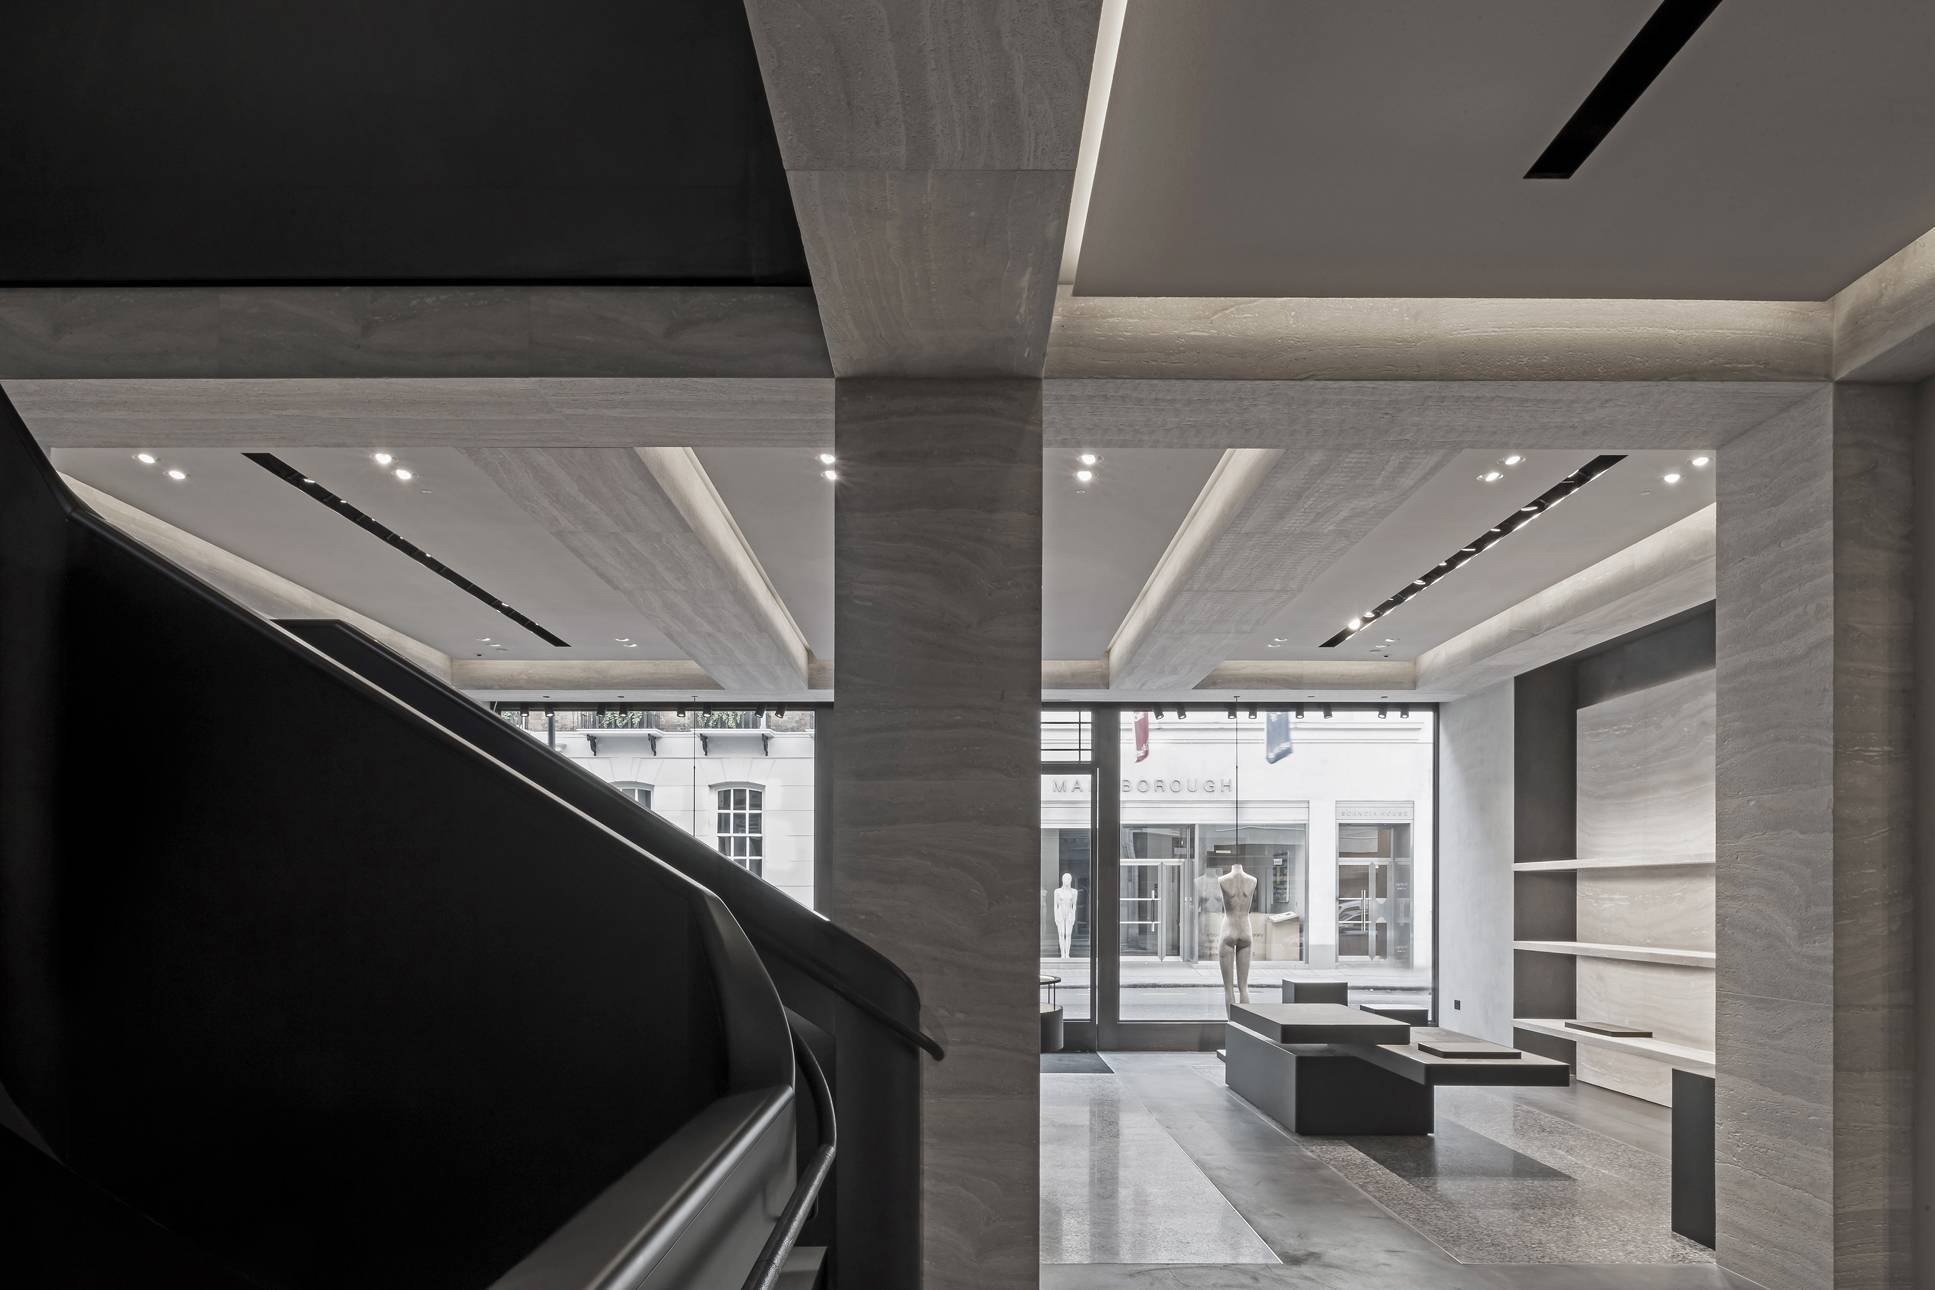 Alexander Wang Flagship Store_Vincent Van Duysen Architects_03.jpg